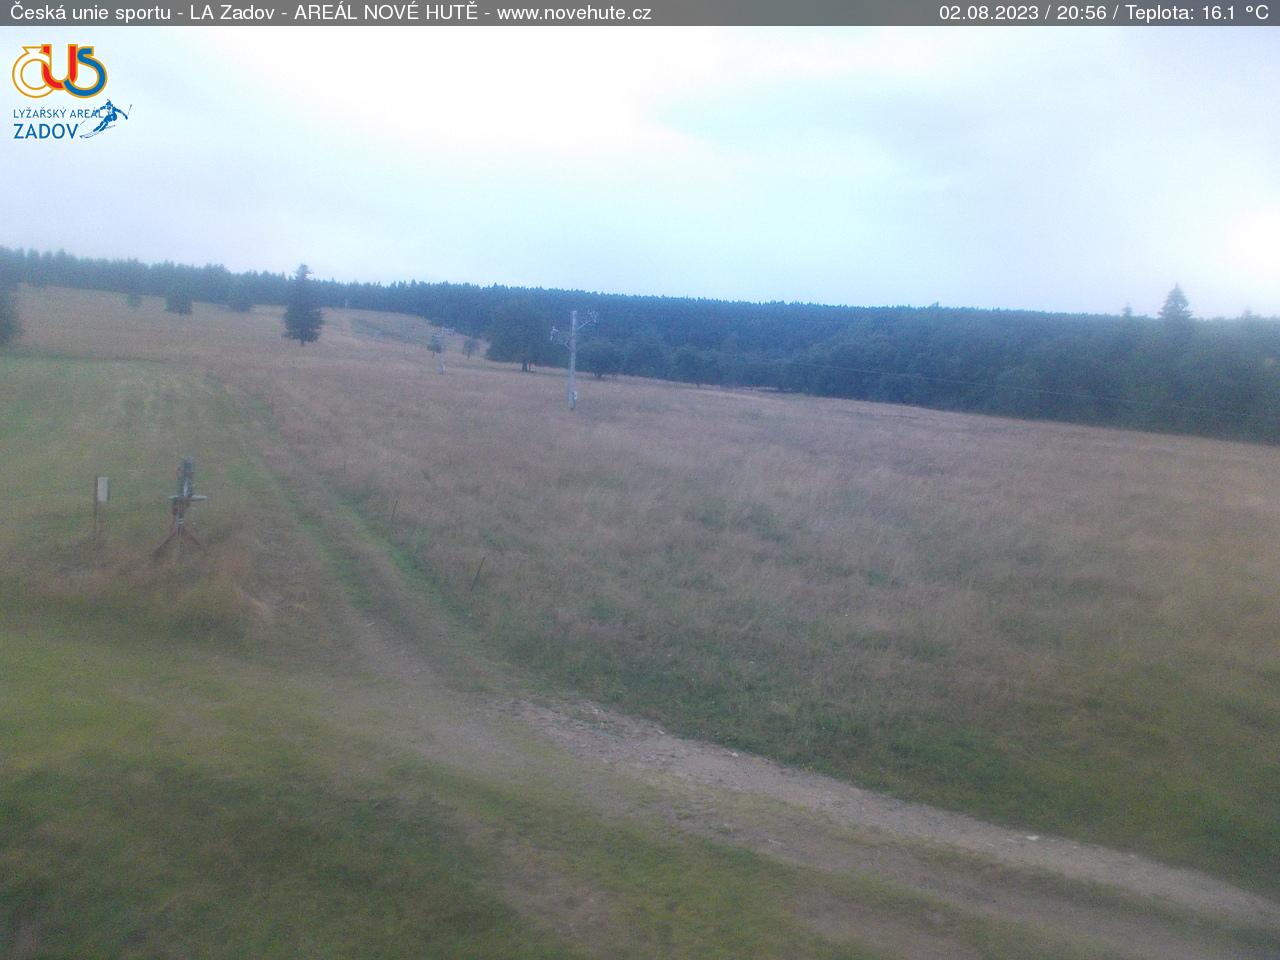 Webcam Ski Resort Zadov - Churanov Nove Hute - Bohemian Forest